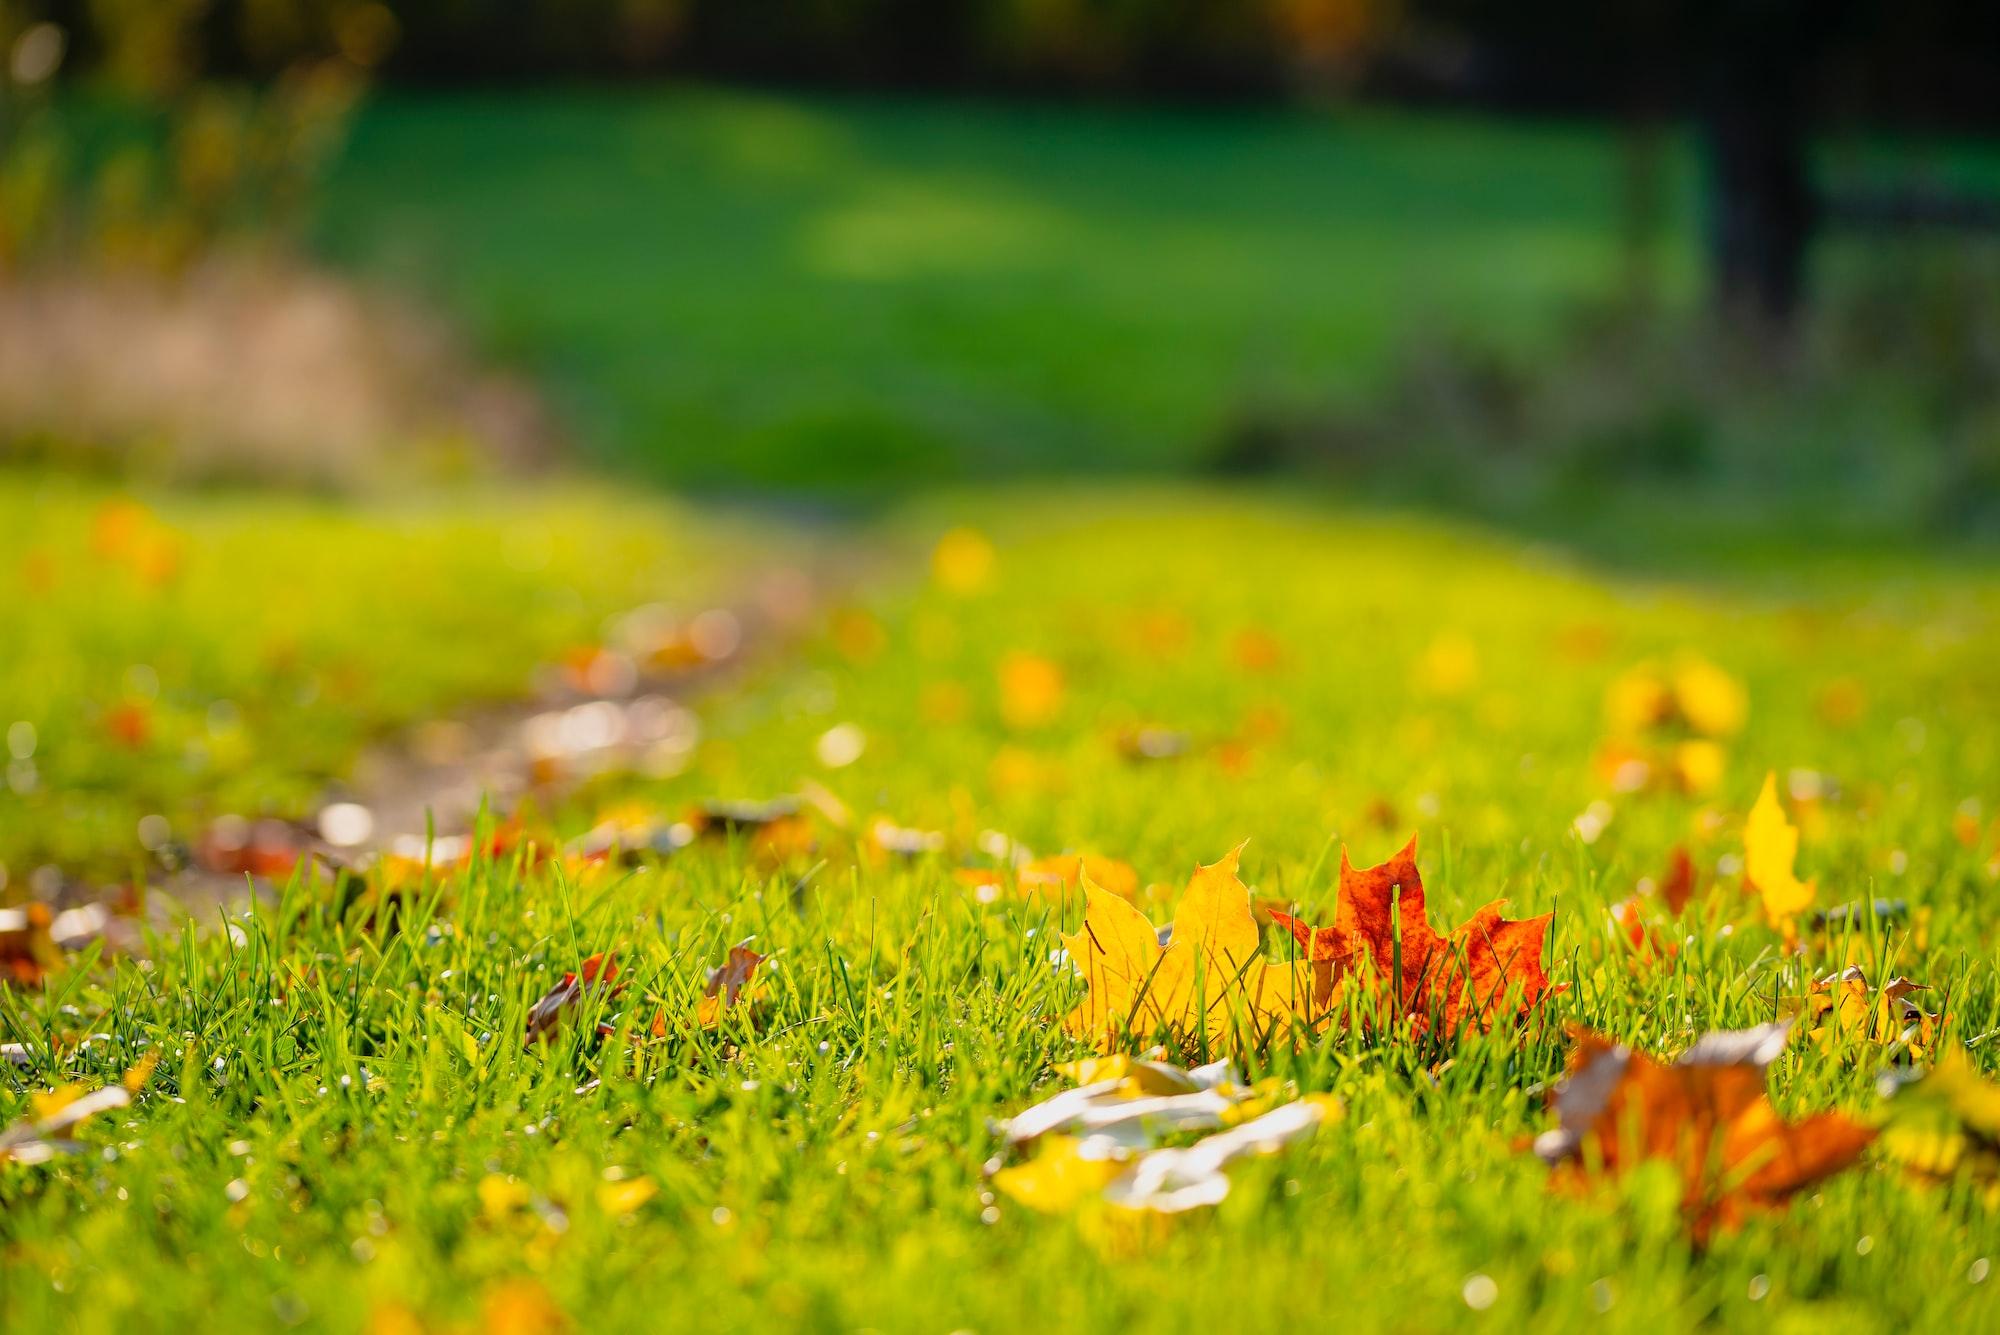 Getting Your Yard Fall Ready